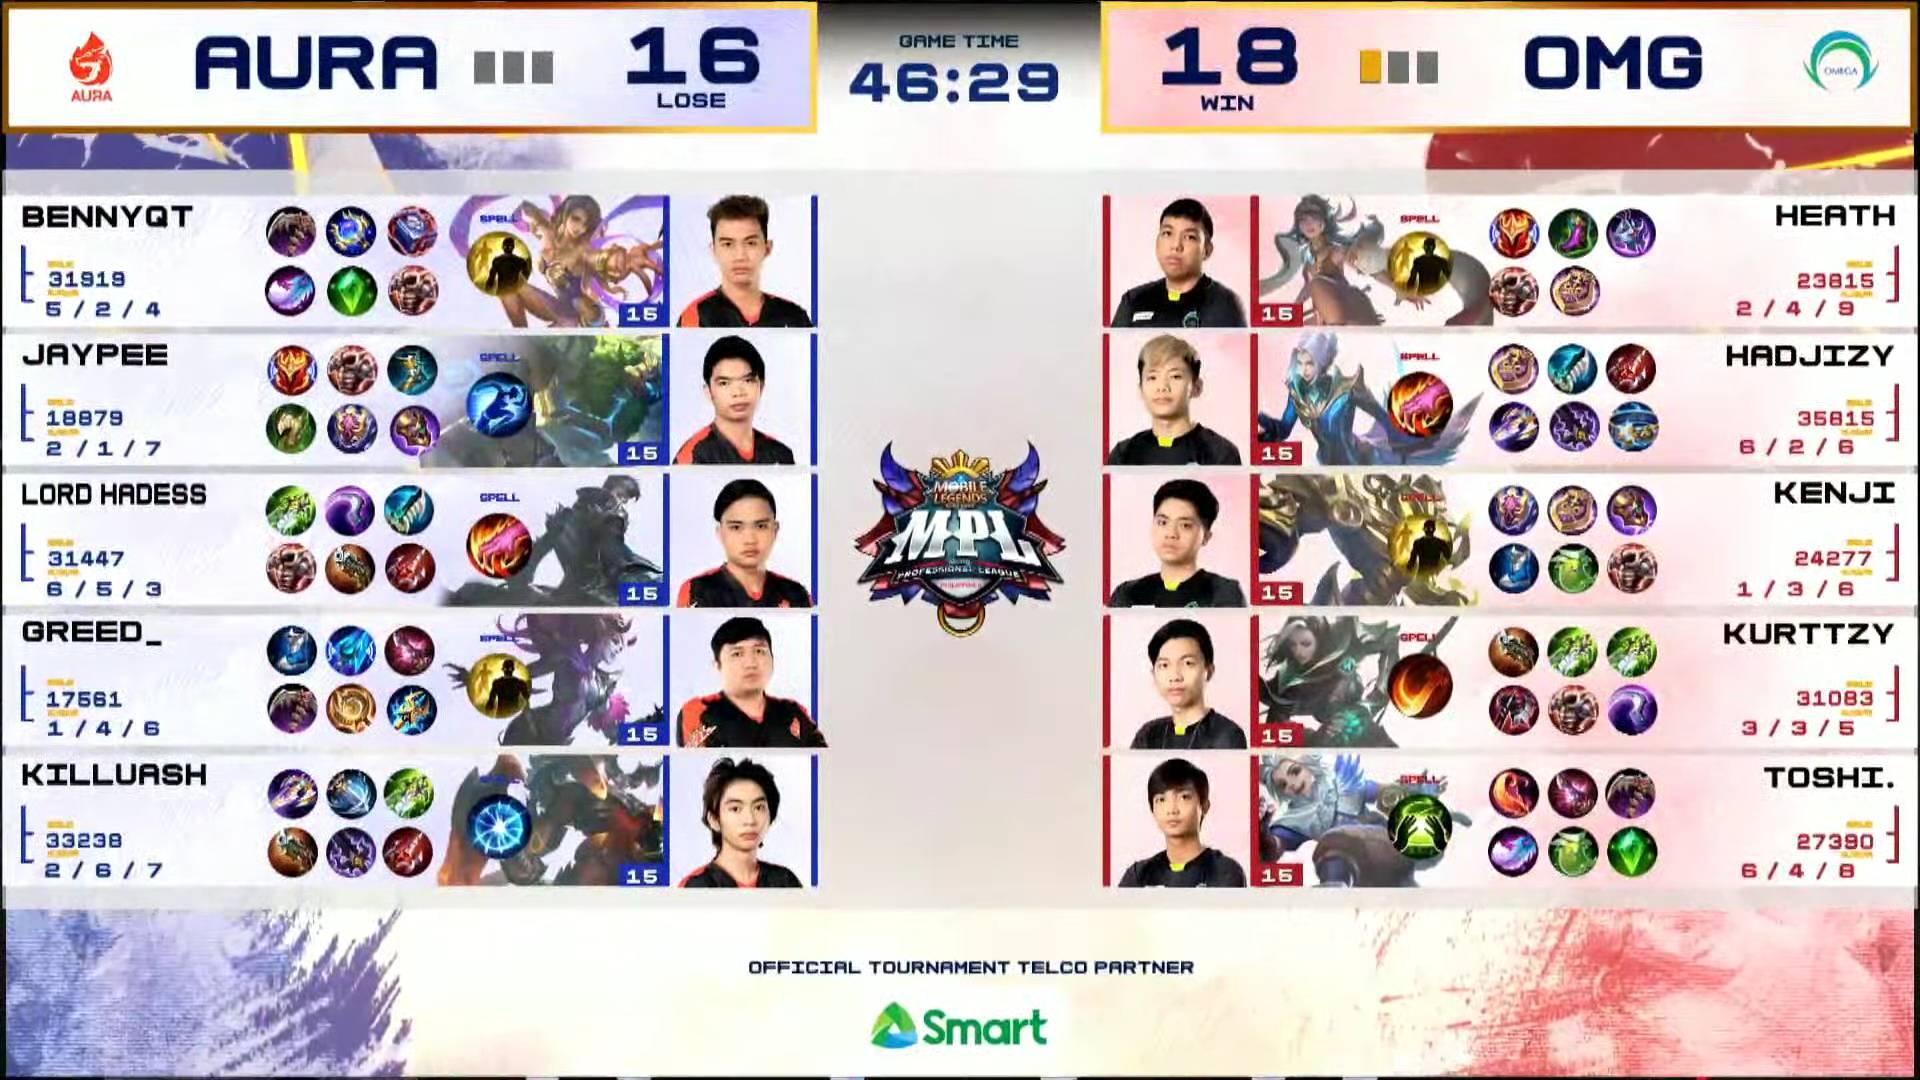 MPL-PH-Season-7-Lower-brack-Aura-def-Omega-Game-1 Bennyqt's Lunox rises as Aura PH outlasts Omega in marathon MPL playoffs match ESports Mobile Legends MPL-PH News  - philippine sports news